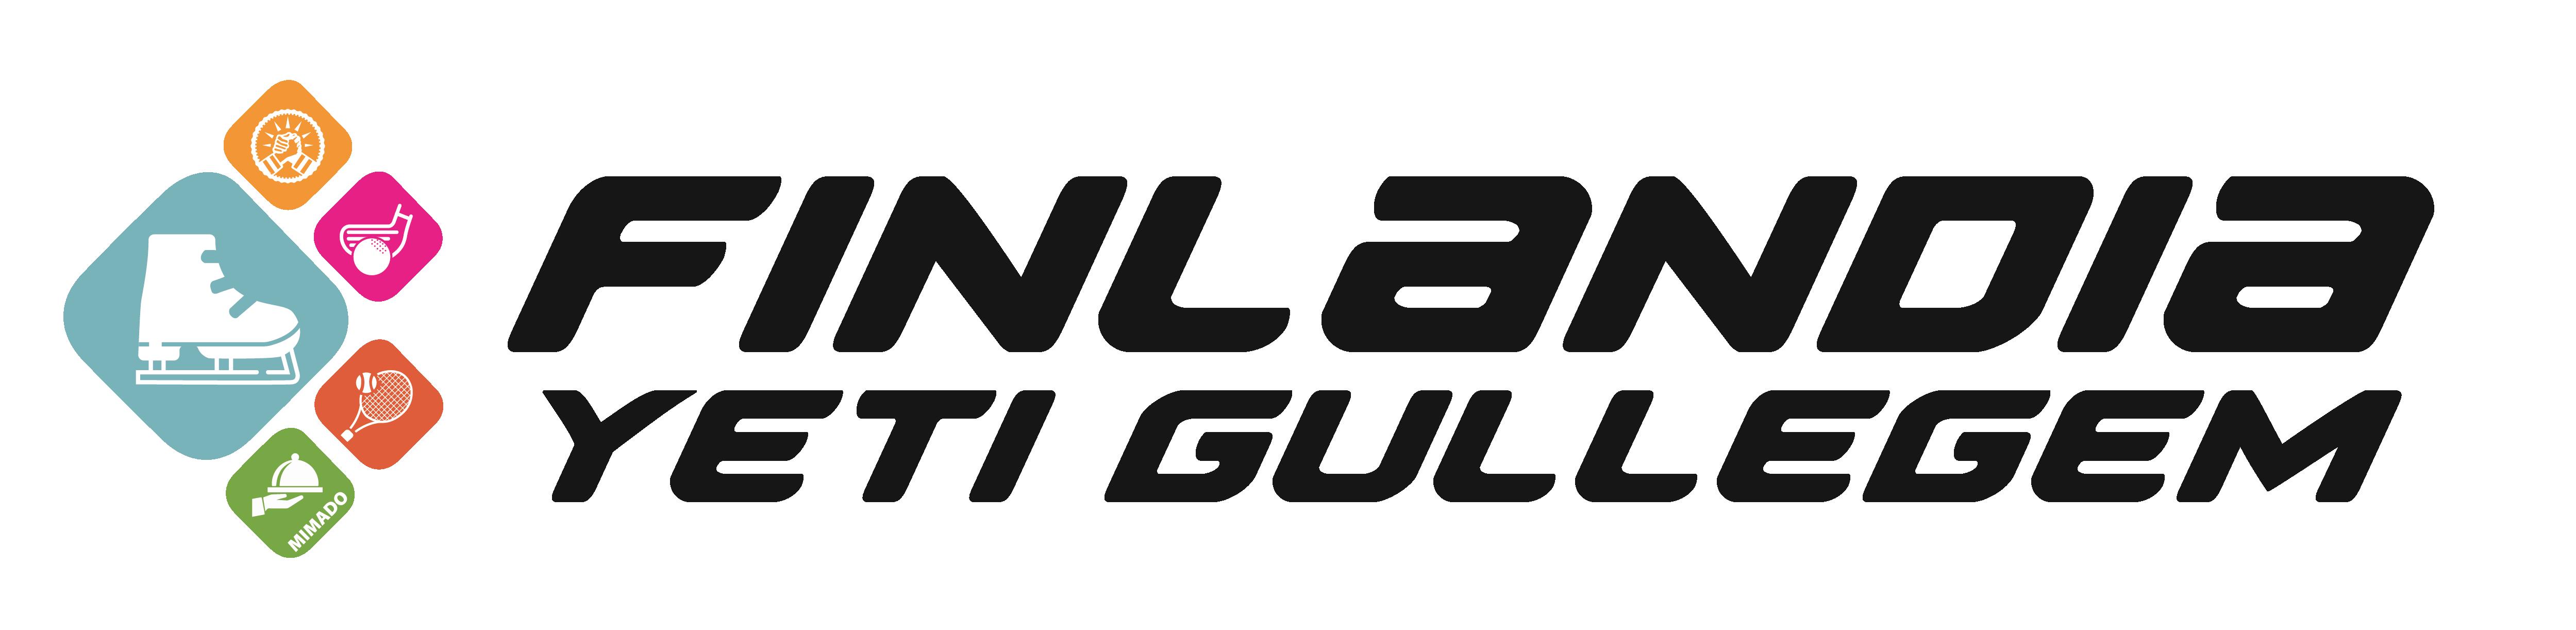 FinlandiaL Yeti Gullegem Logo